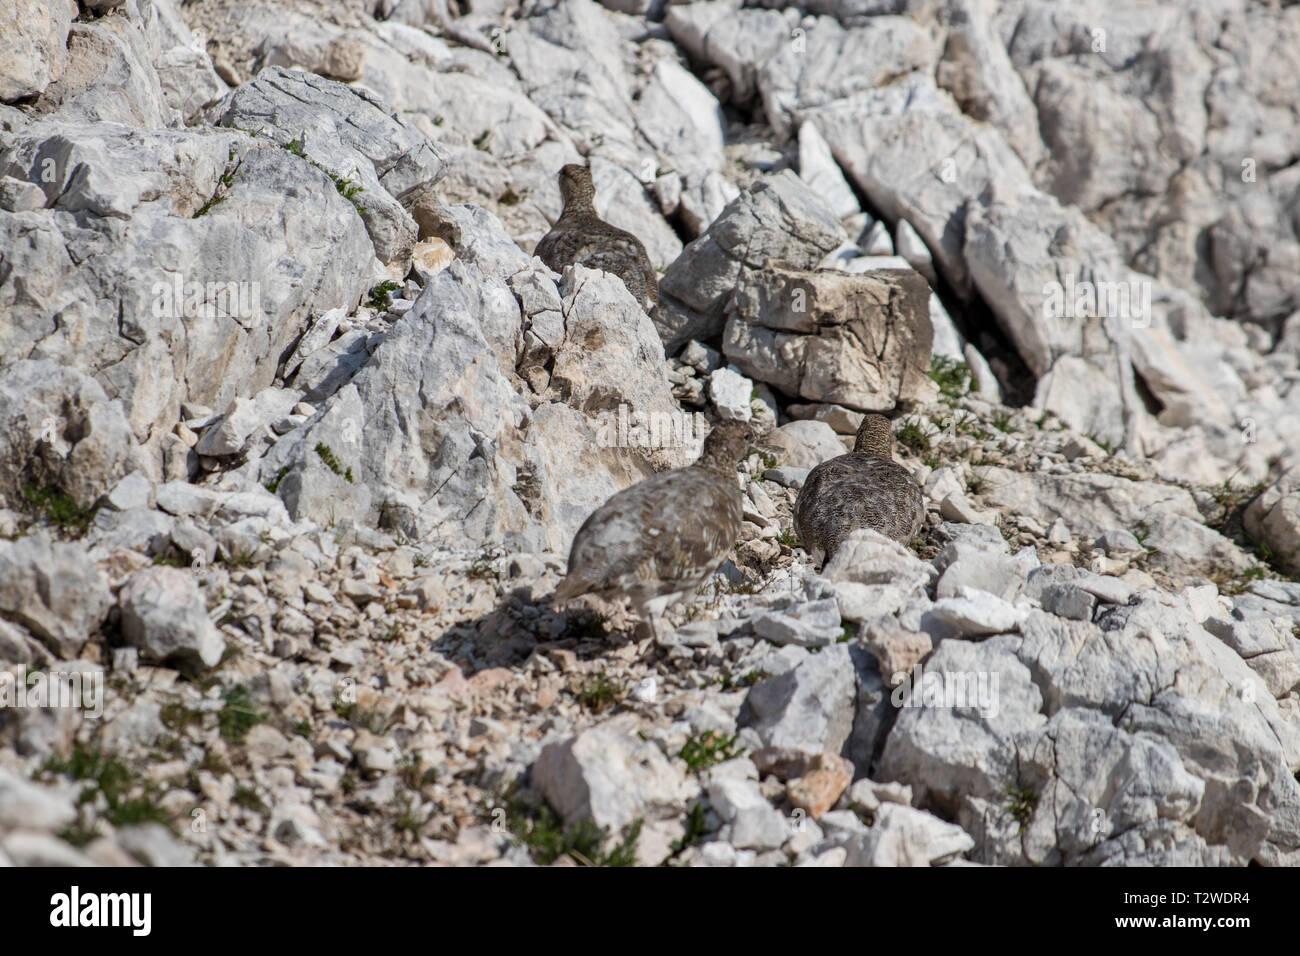 three rock ptarmigan walking - Stock Image